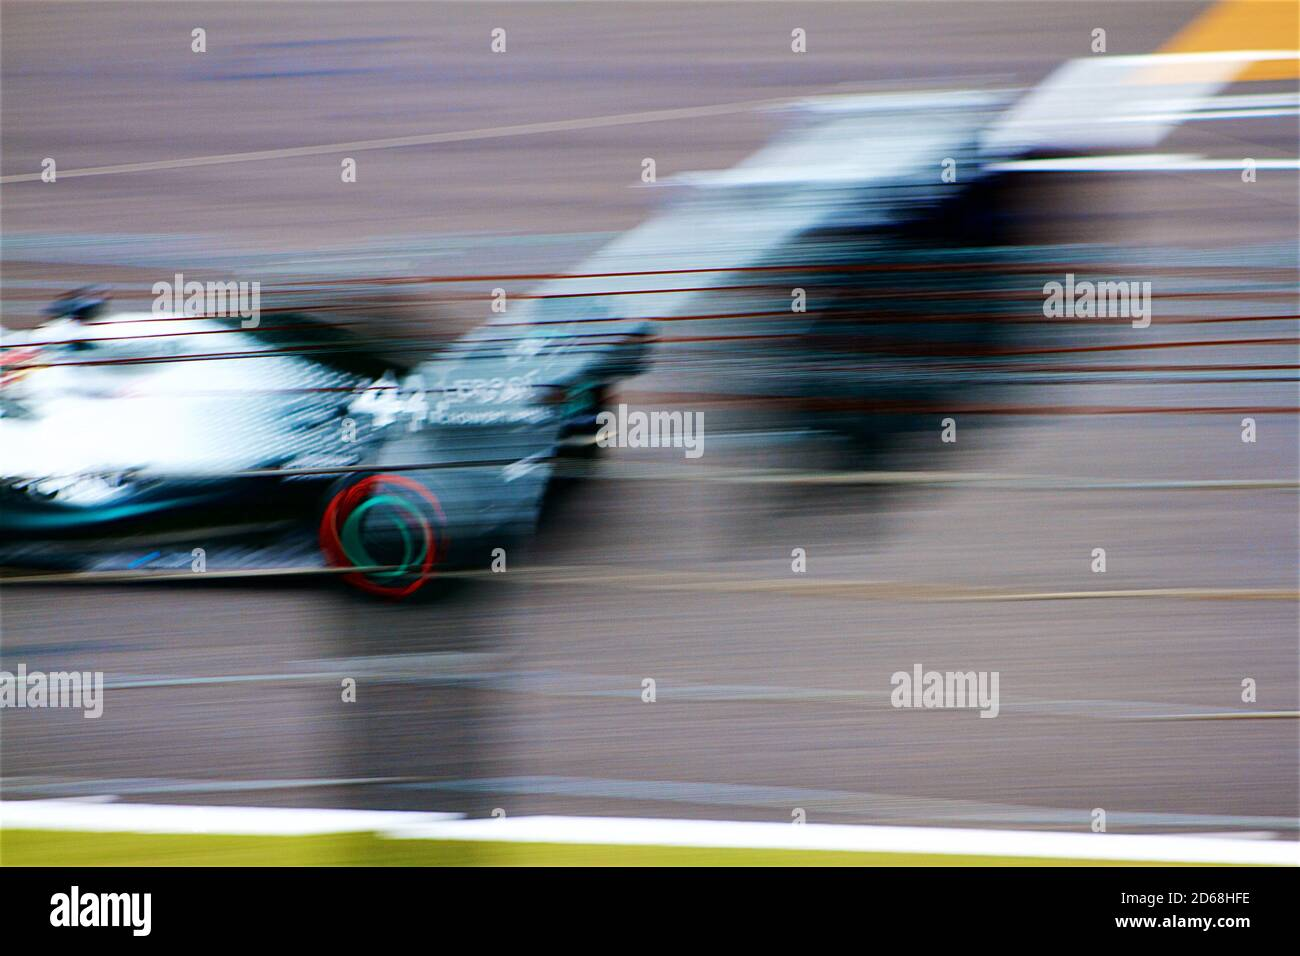 F1 Banque D'Images